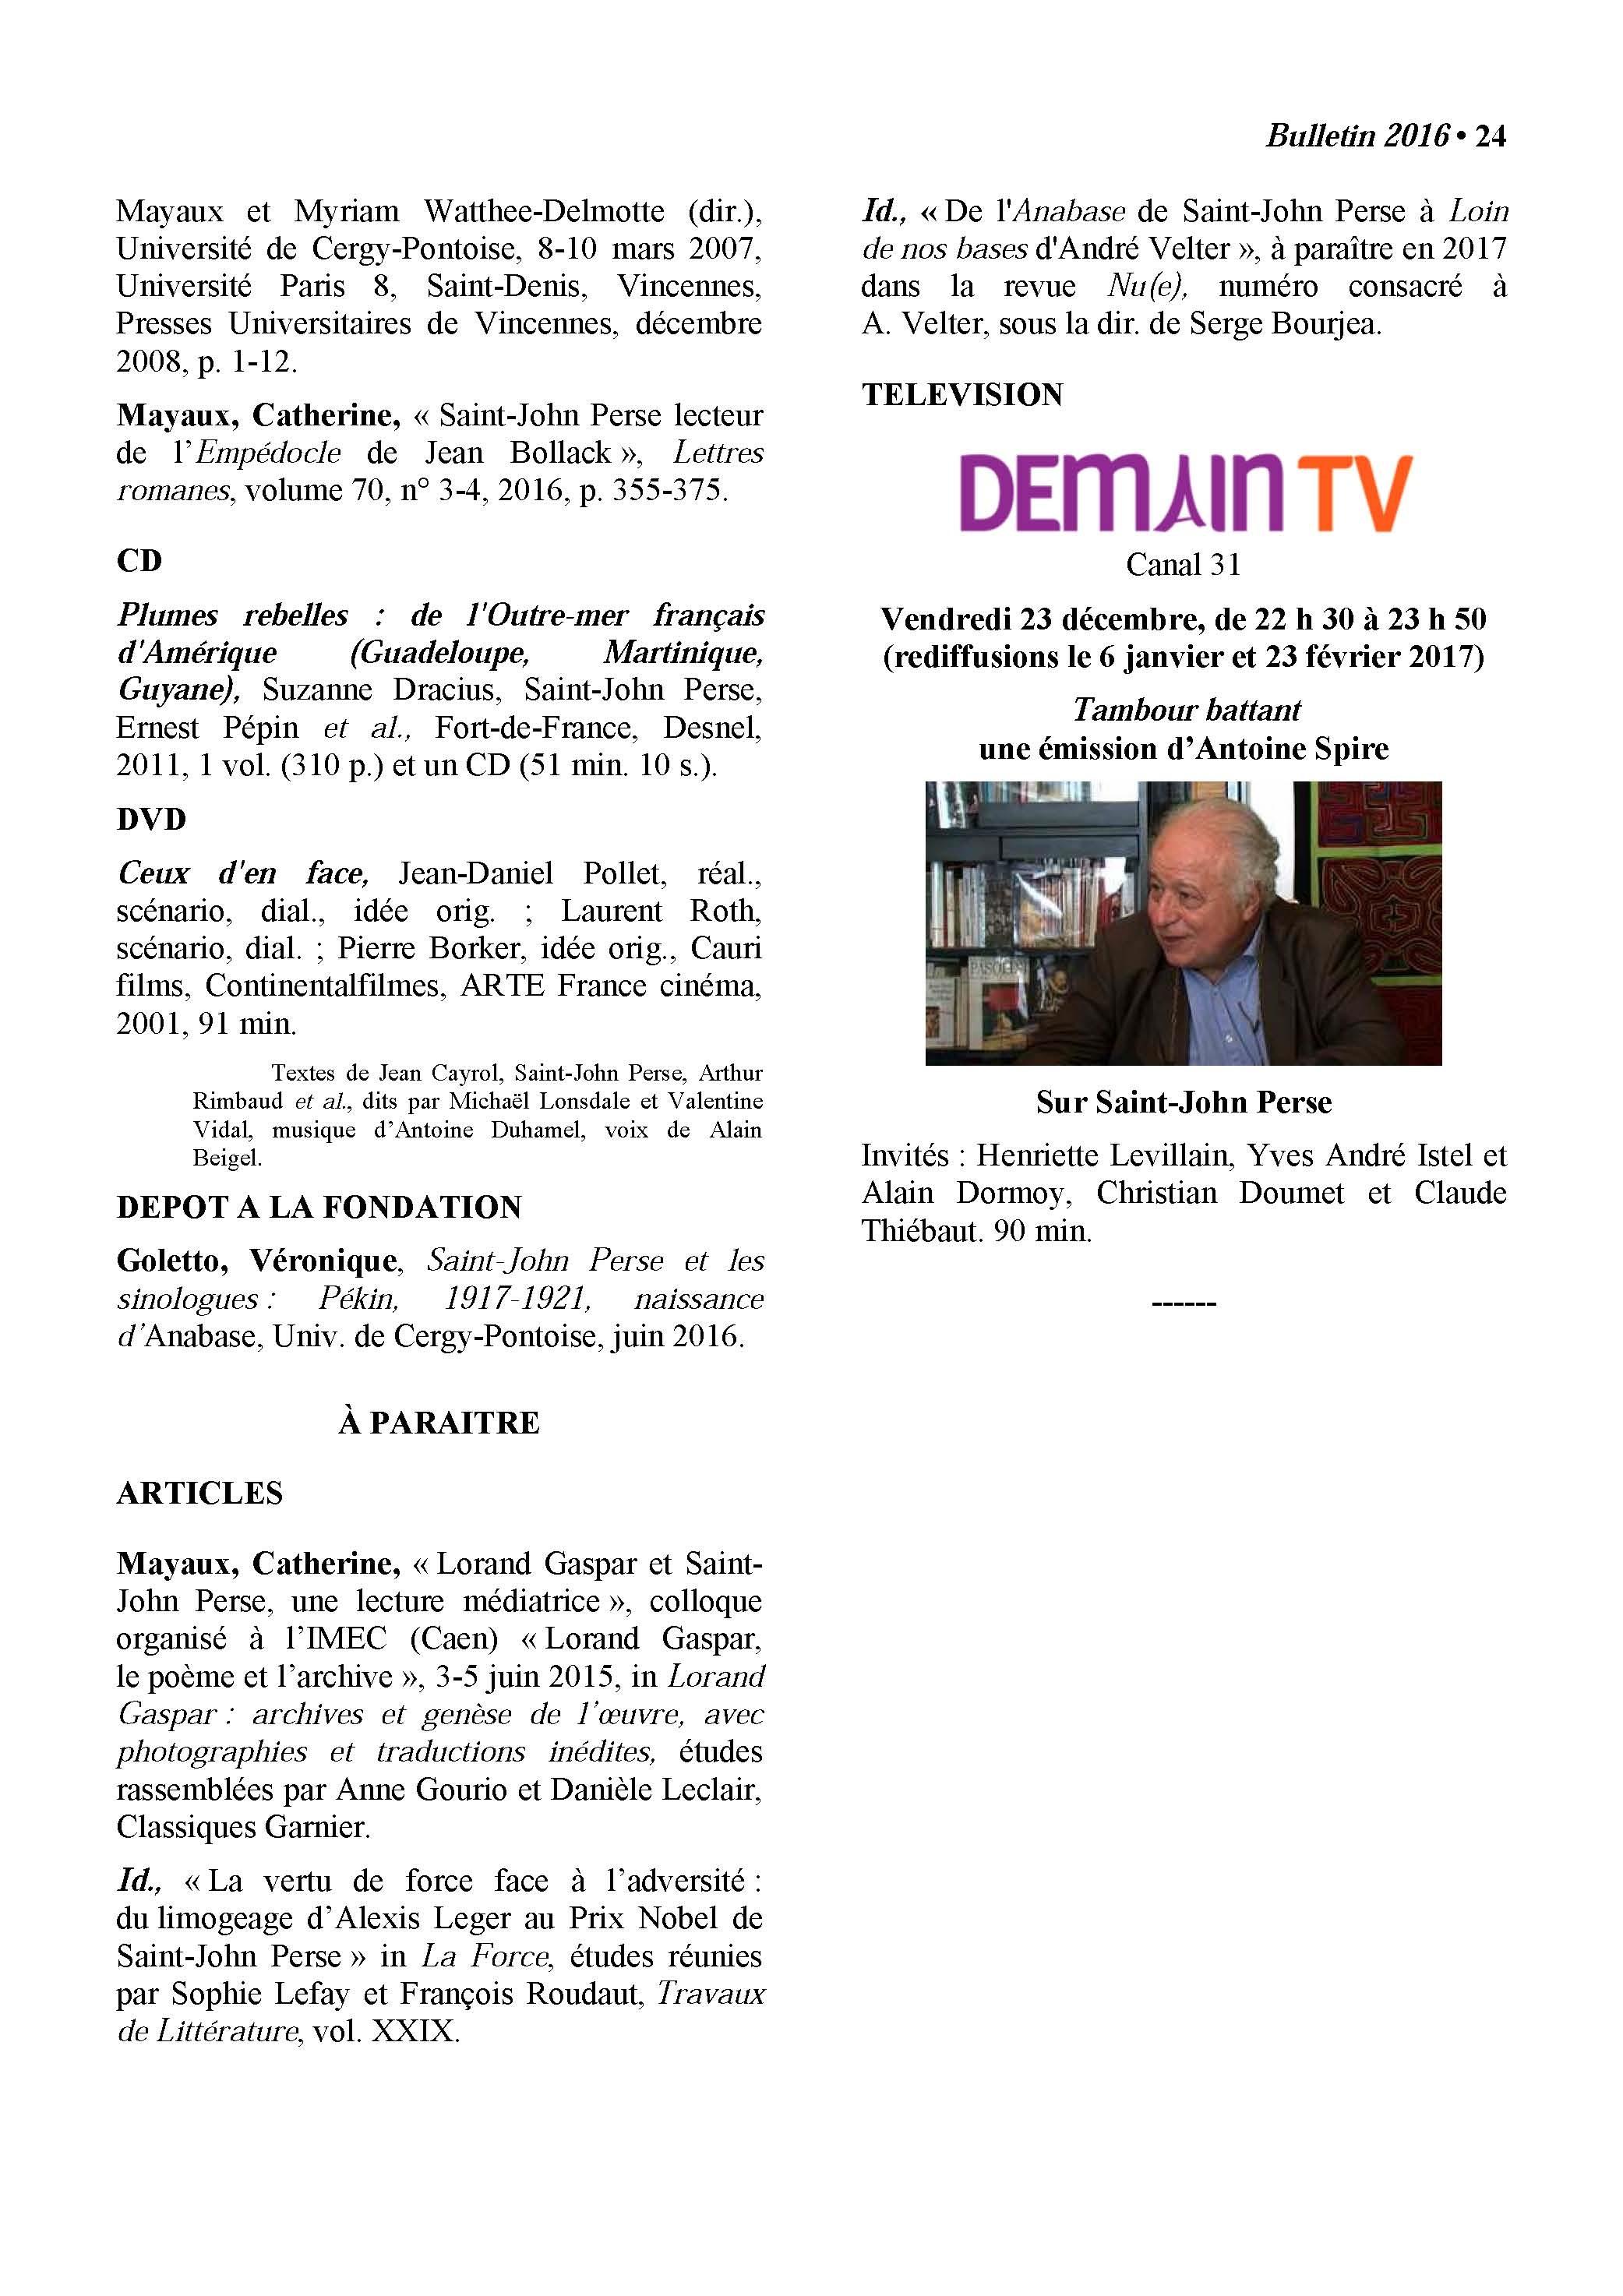 bulletin_2016_aafsjp-24-annonces